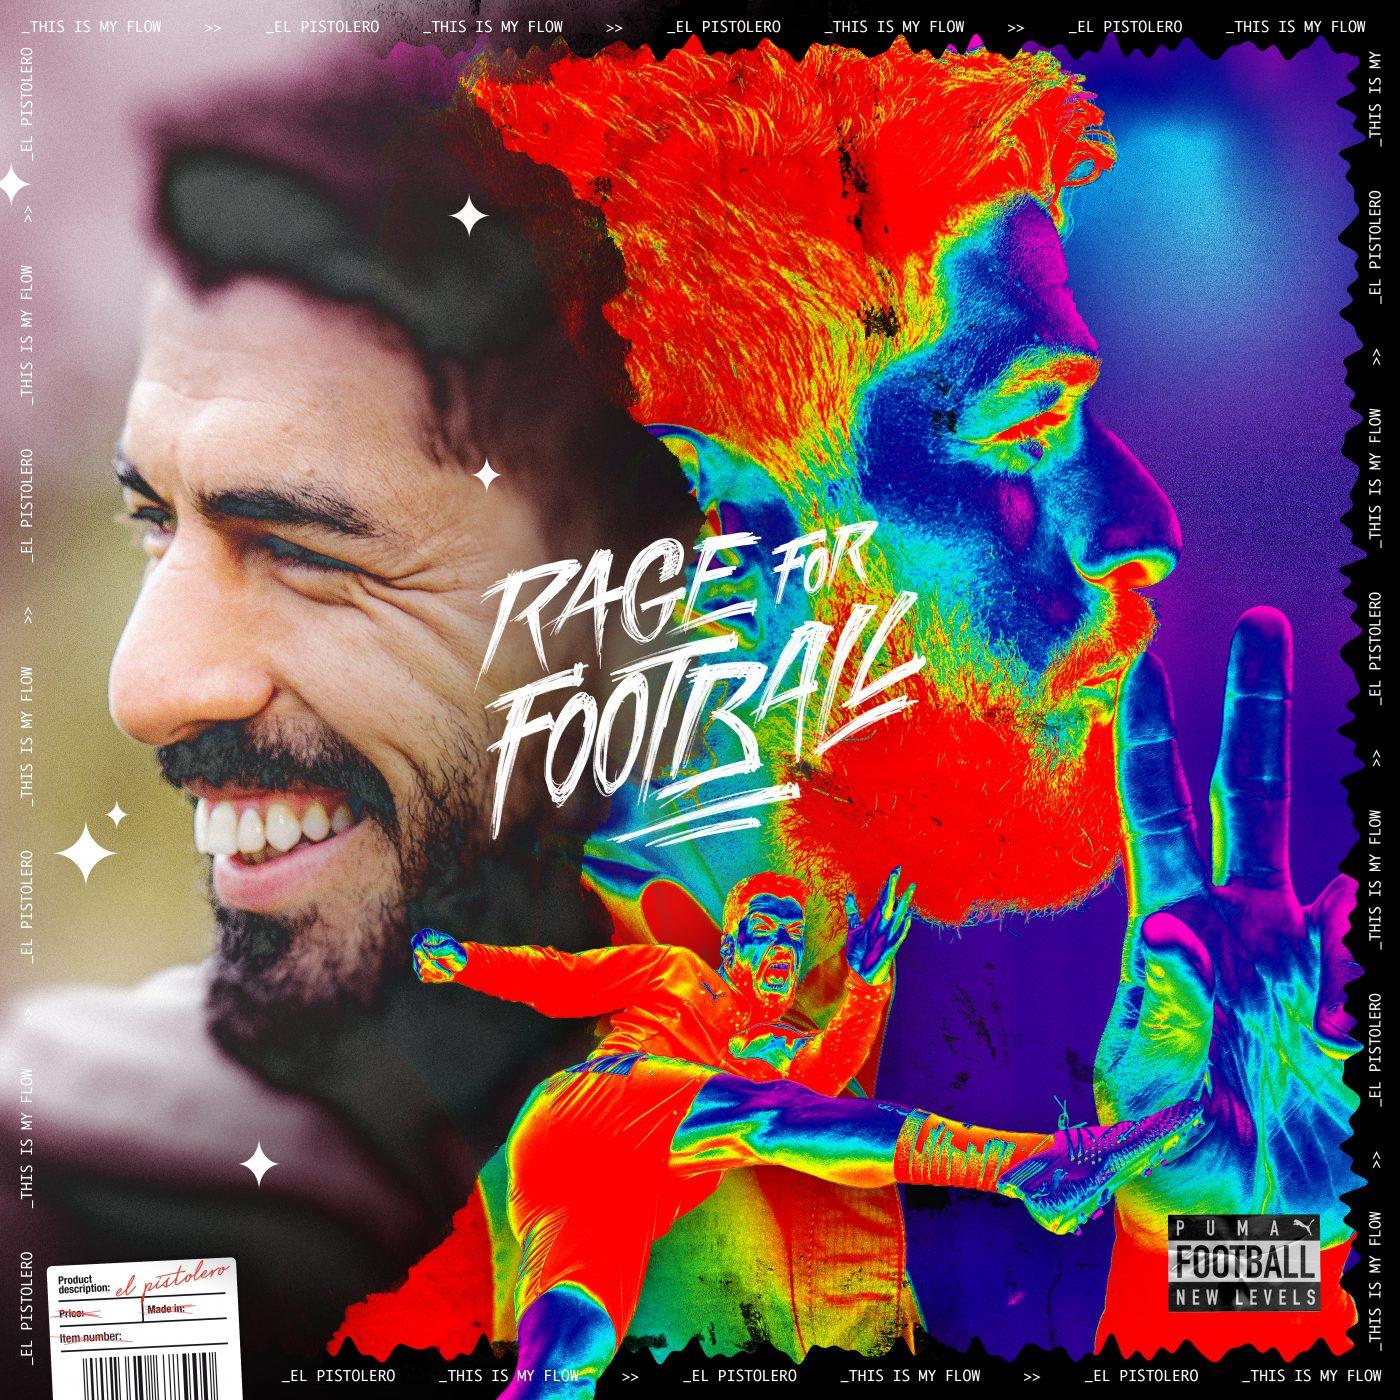 cover-puma-football-ambassadeur-pack-anthem-9